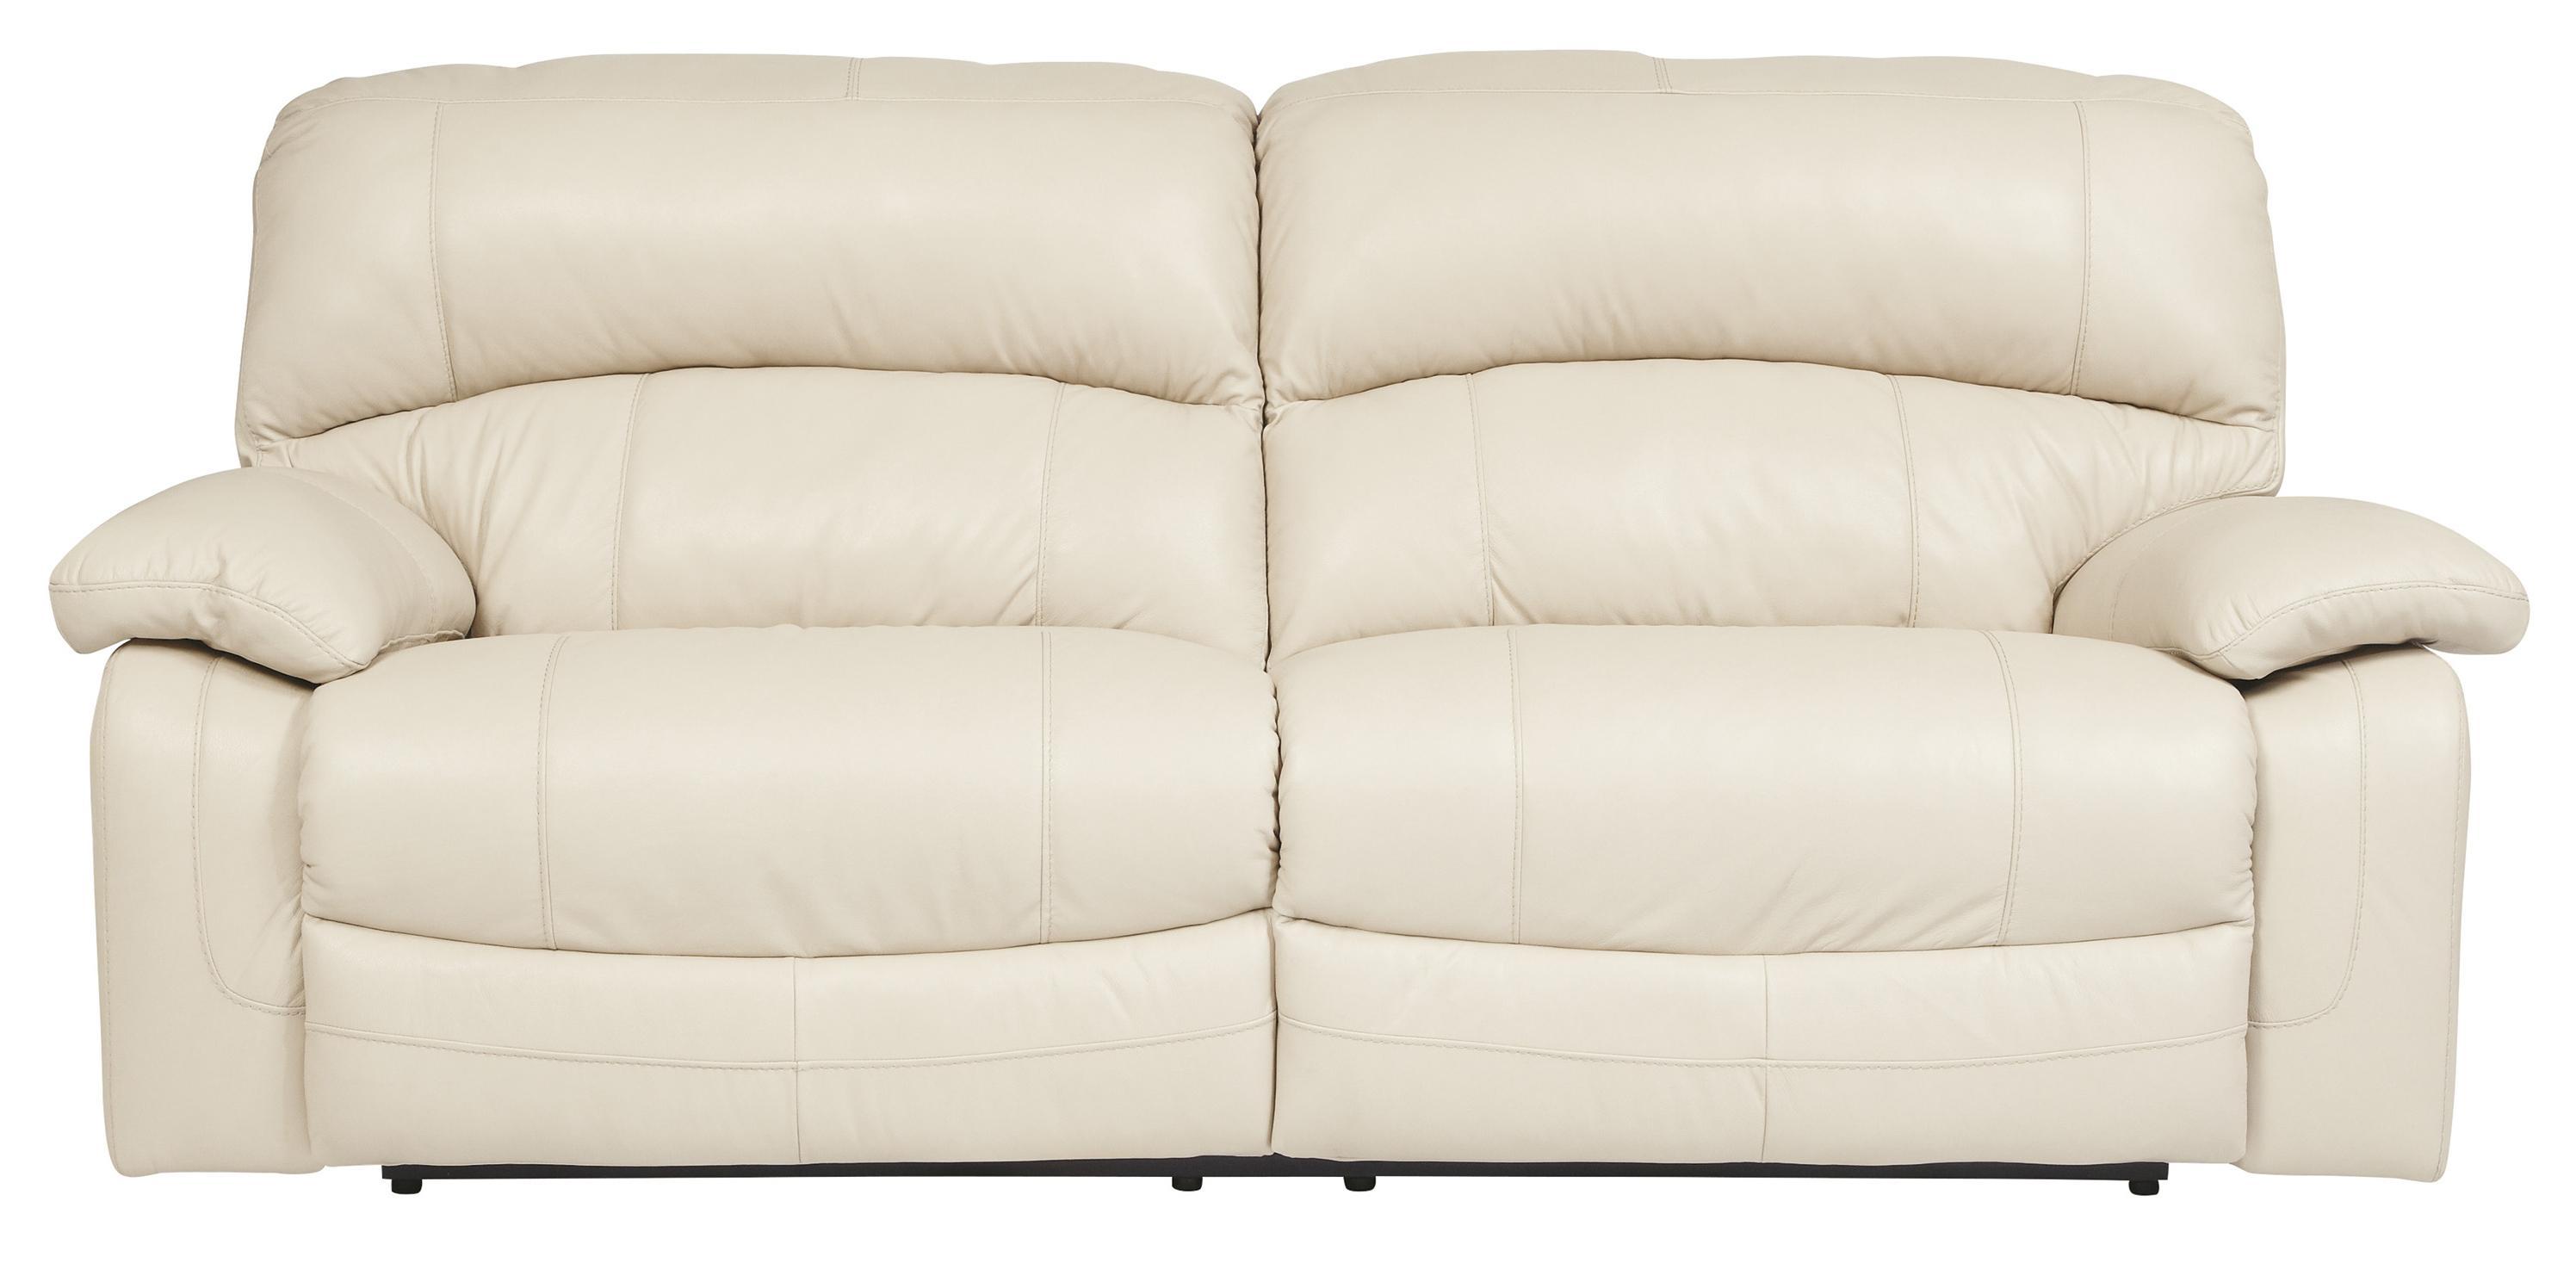 Signature Design By Ashley Damacio   Cream Leather Match 2 Seat Reclining  Power Sofa